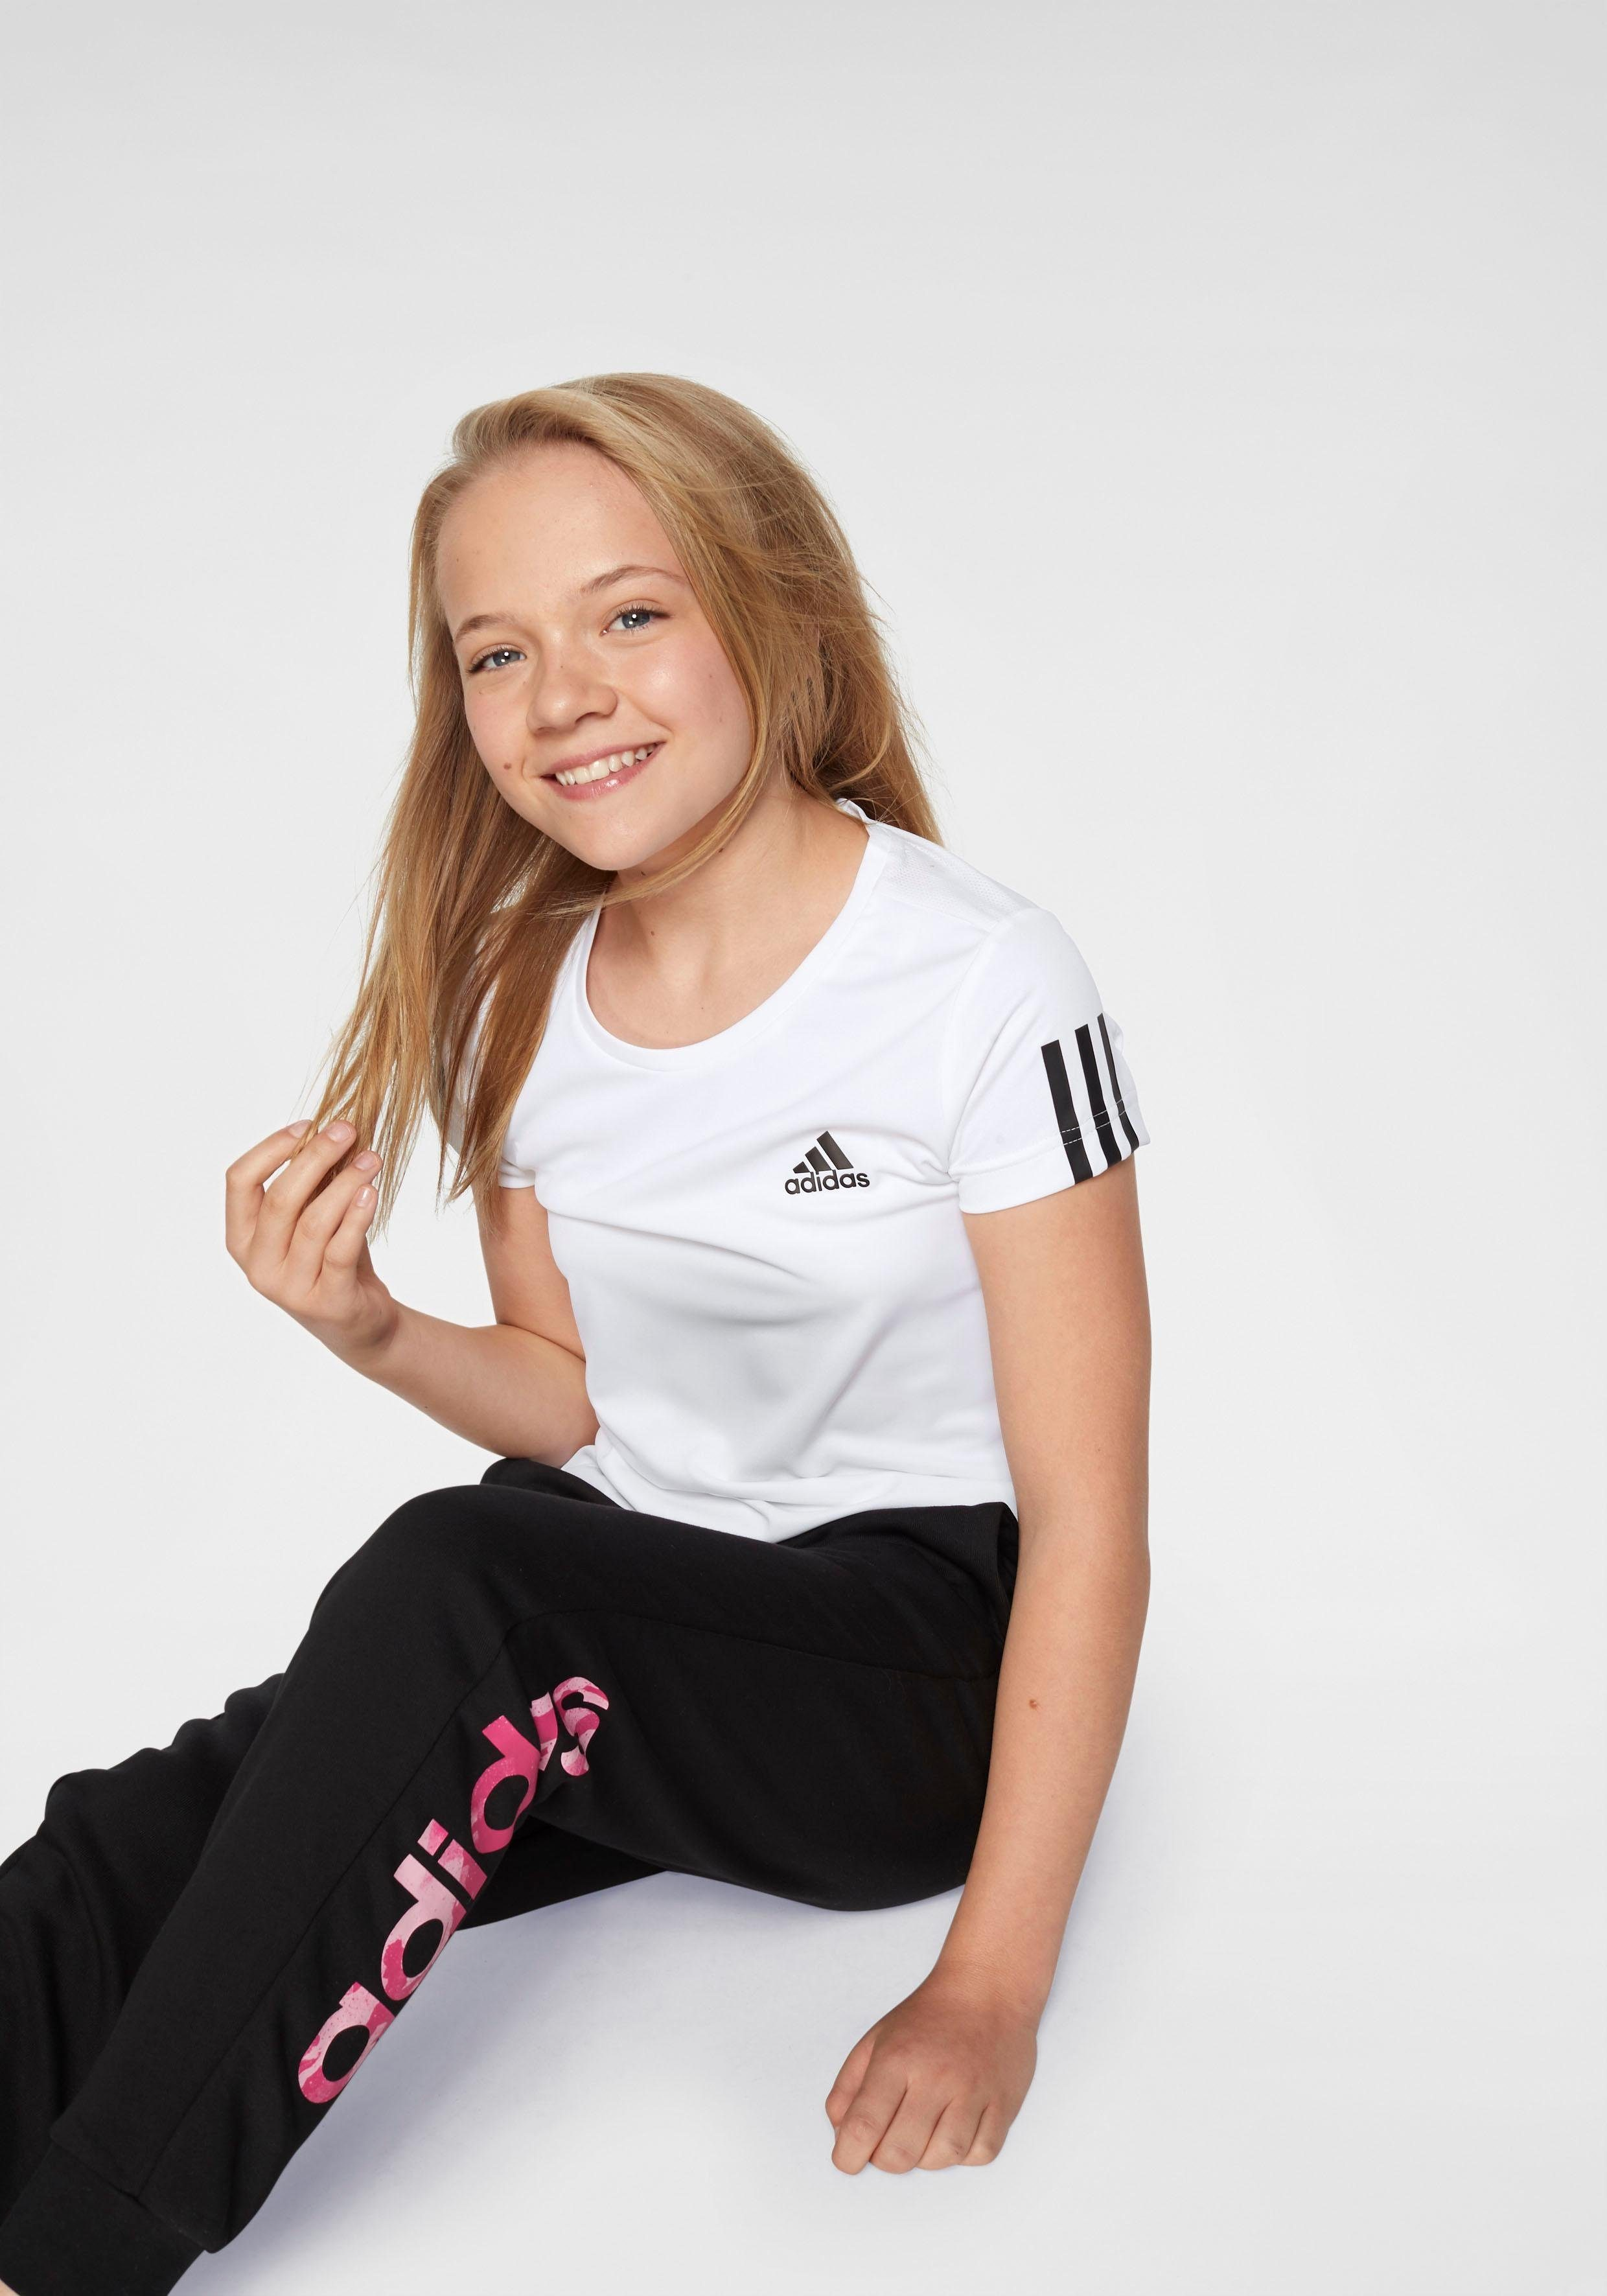 Damen,  Kinder,  Mädchen adidas Performance Trainingsshirt »YOUNG GIRL TRAINING EQUIPMENT TEE« weiß   04060515881521, 04062049526343